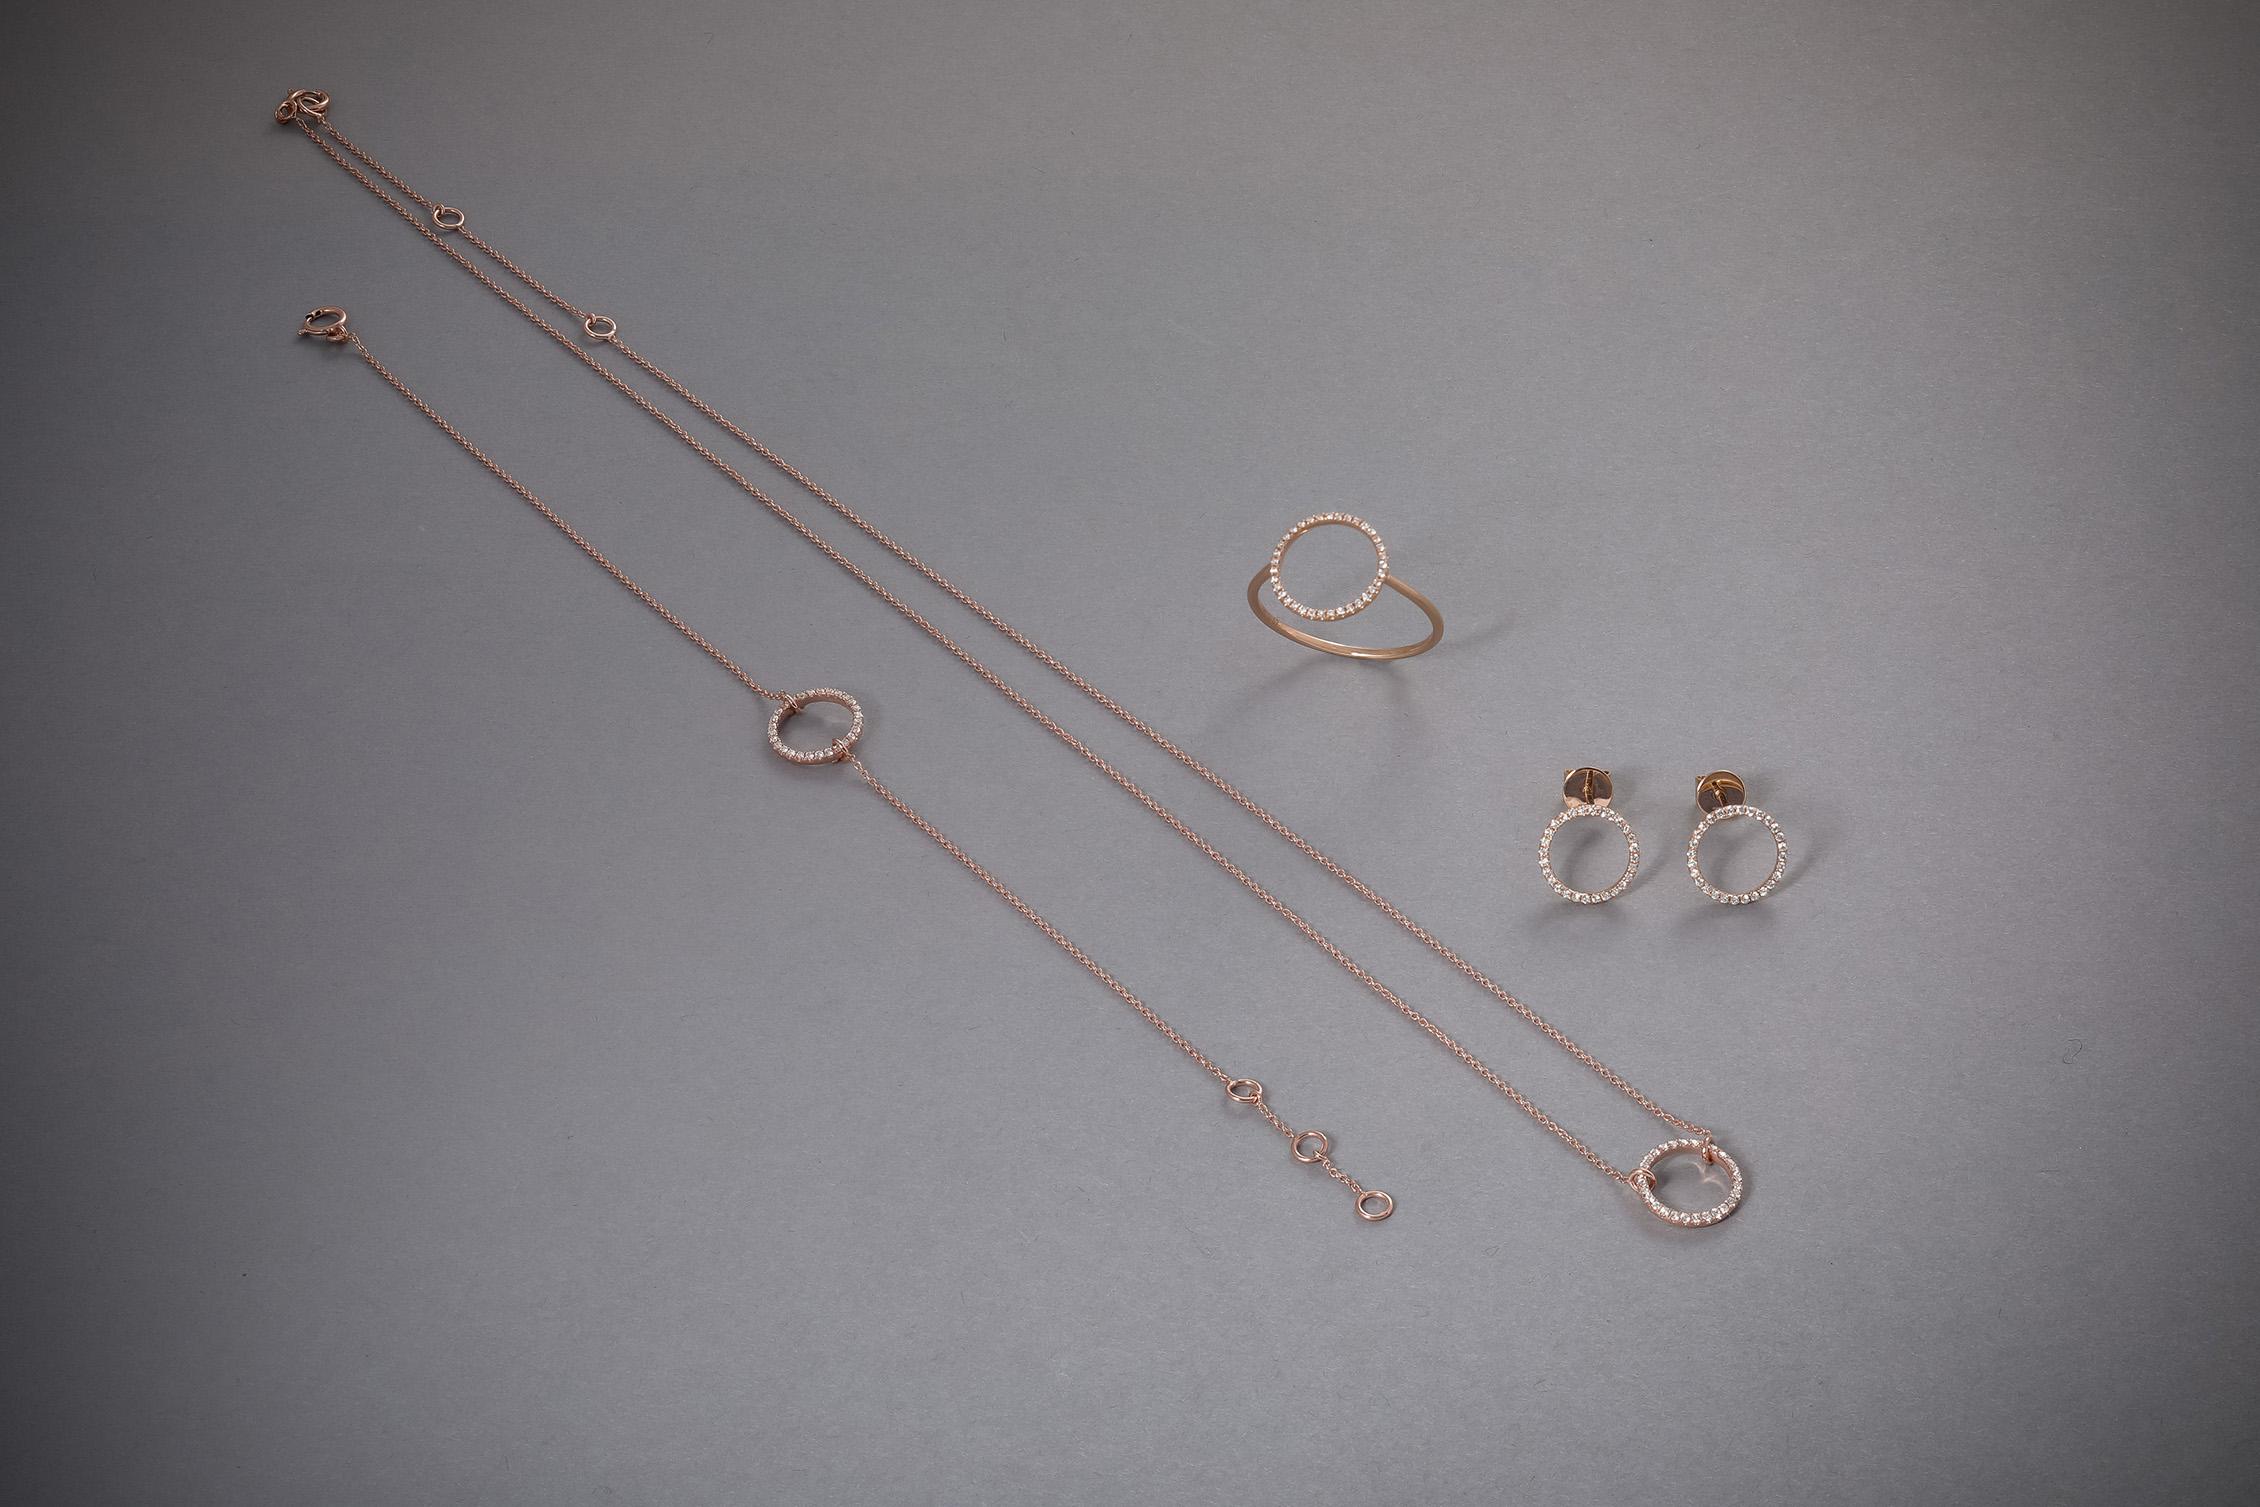 112 18kt Roségoldarmband, Brillantkreis, ab € 384,-, 18kt Weißgoldkette, Brillantkreis, ab € 418,-, 18kt Weißohrstecker, Brillantkreis, ab € 538,-, 18kt, Weißgoldring, Brillantkreis, ab € 456,-